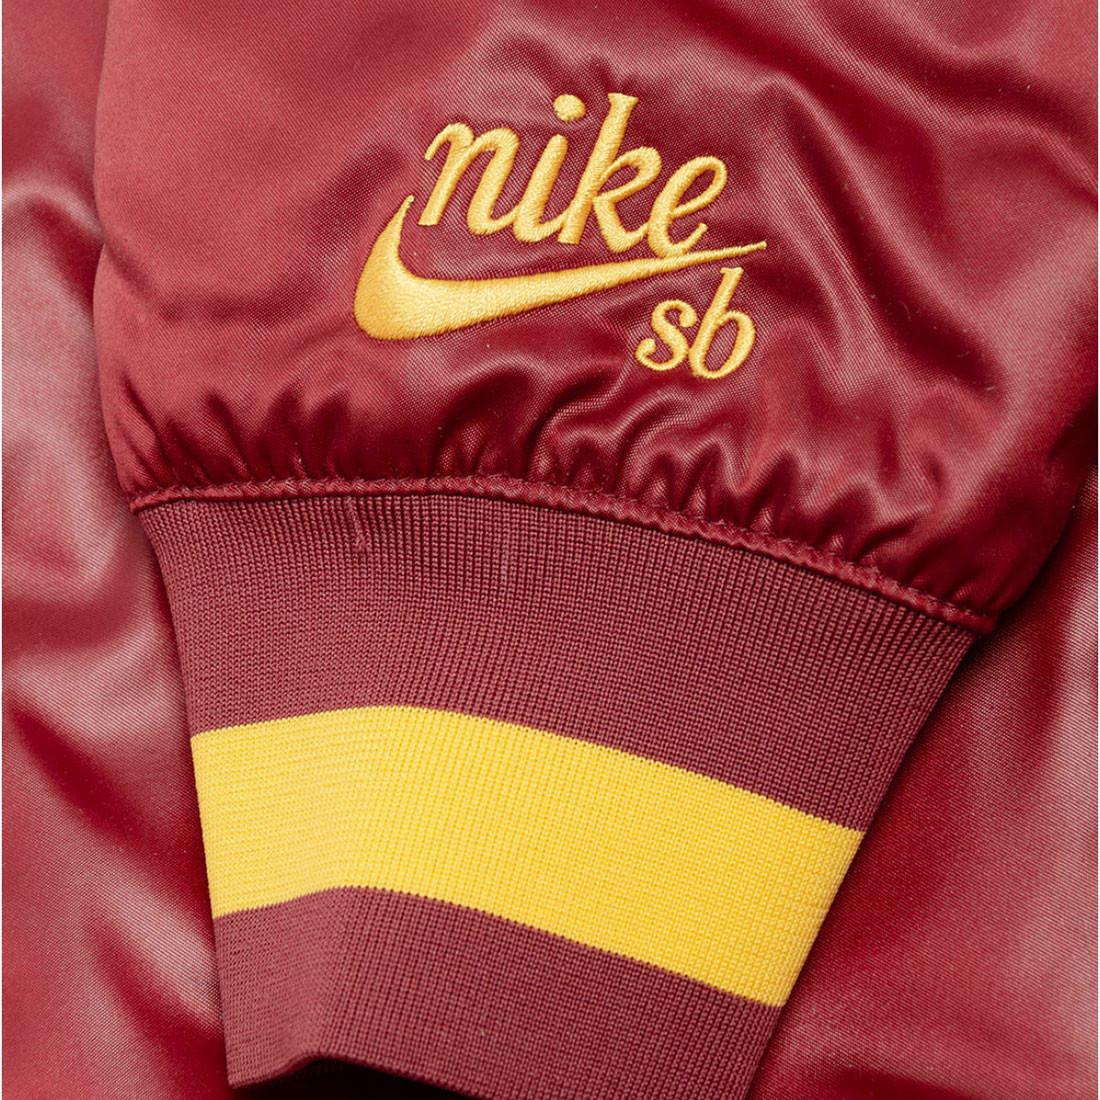 buy online 703b1 cb2cd Street jacket Nike SB Nike Sb X Nba Jacket Bomber